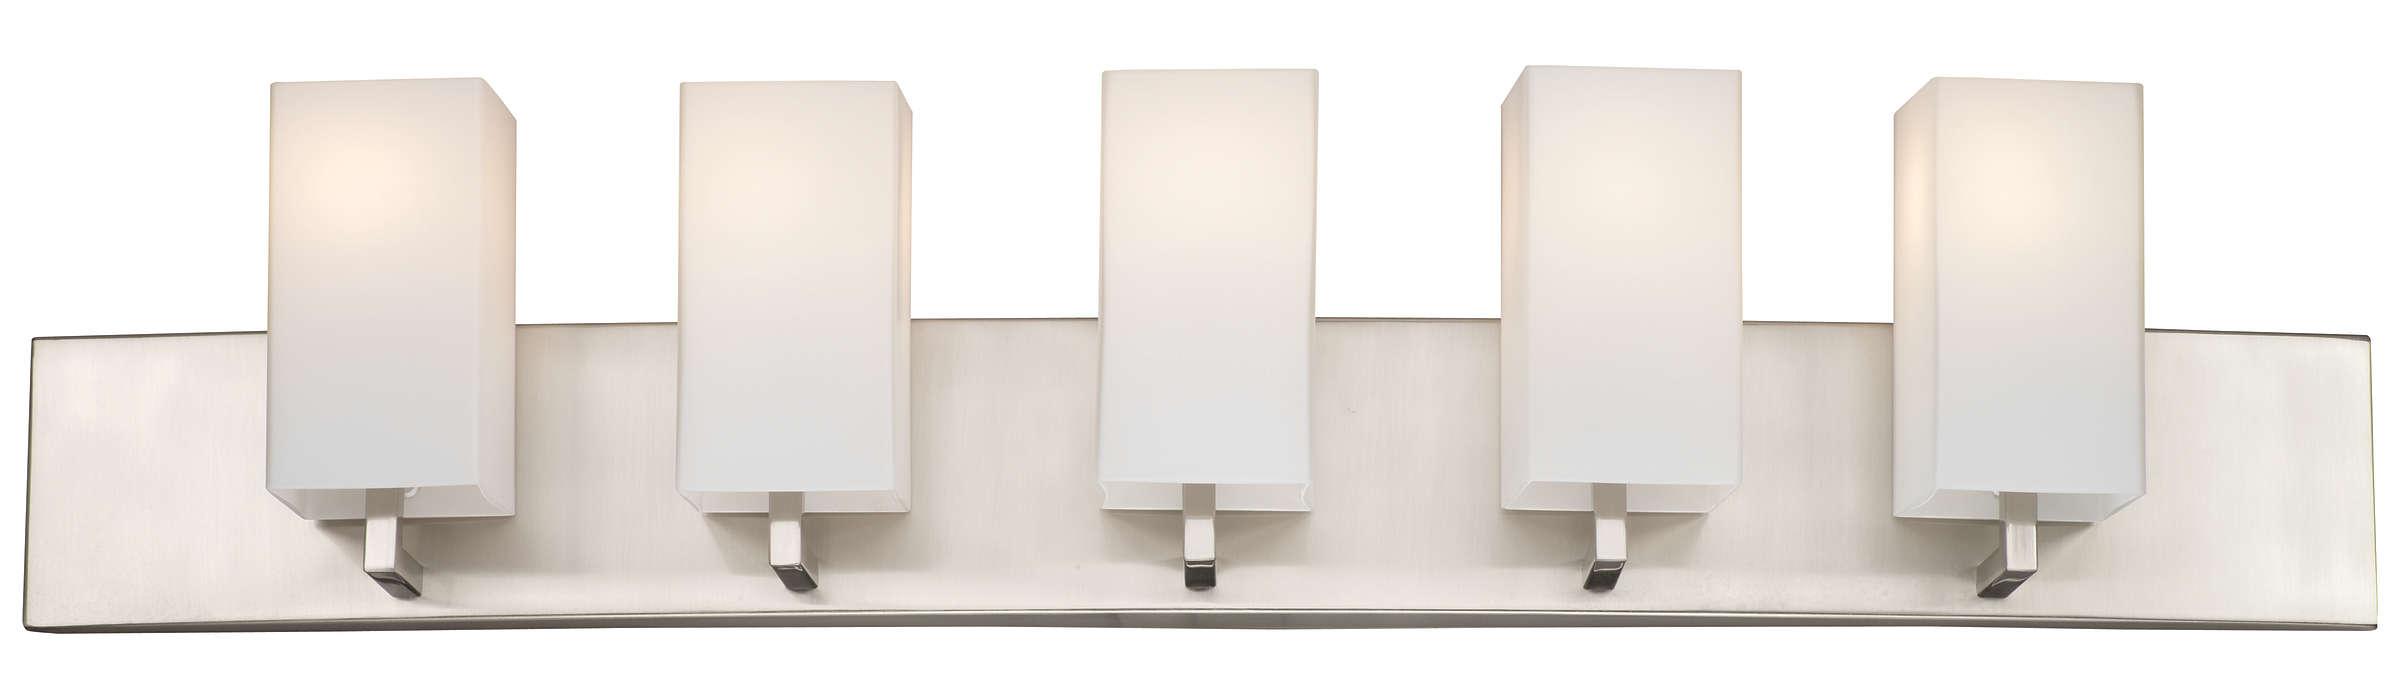 Avenue 5-light Bath in Satin Nickel finish